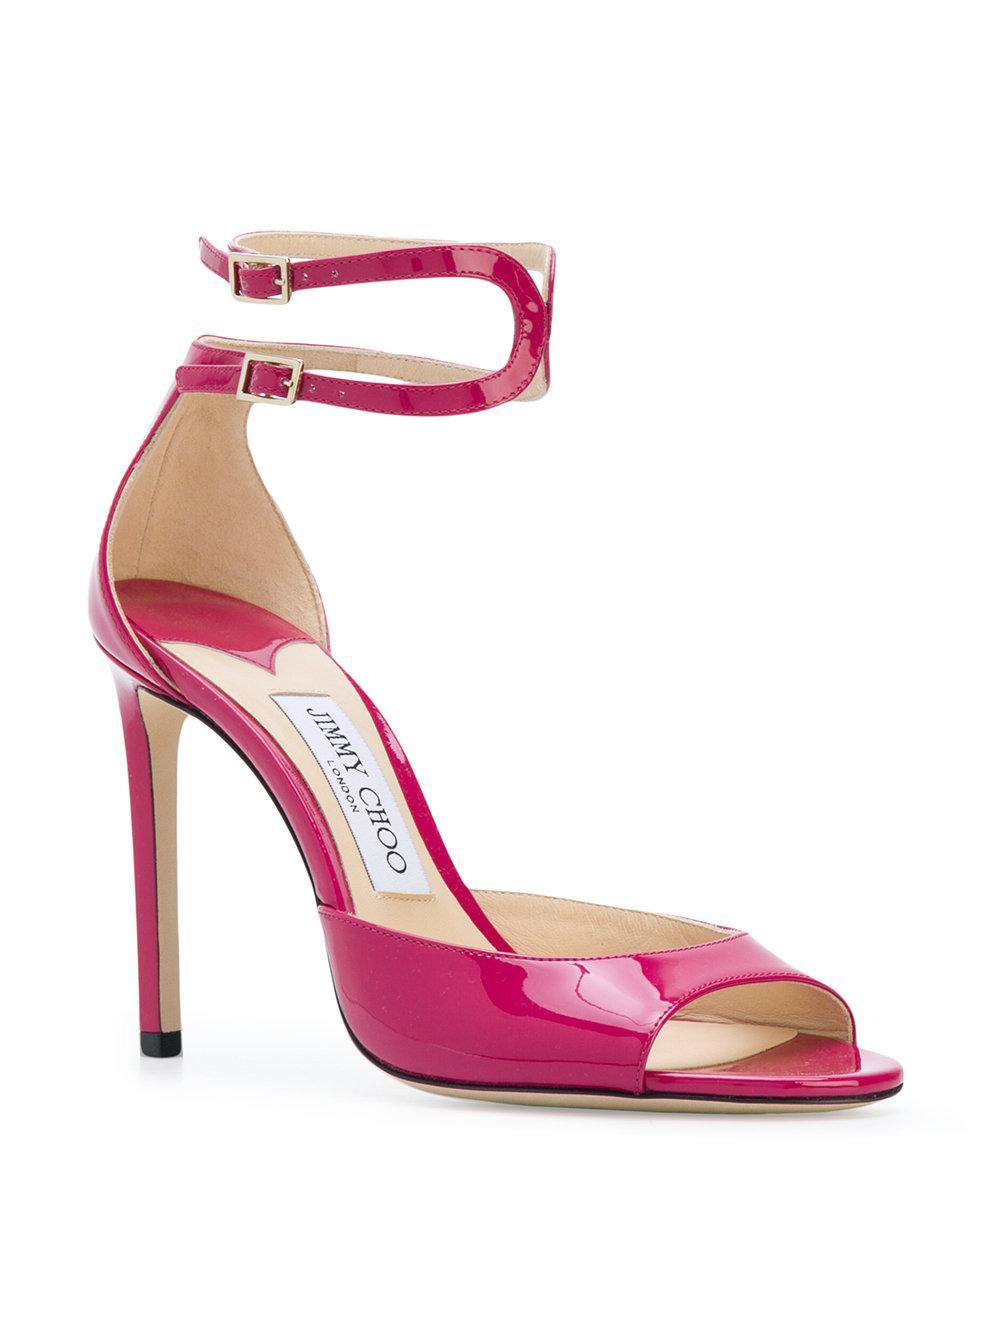 Langpat sandals - Pink & Purple Jimmy Choo London 0vjfWr4